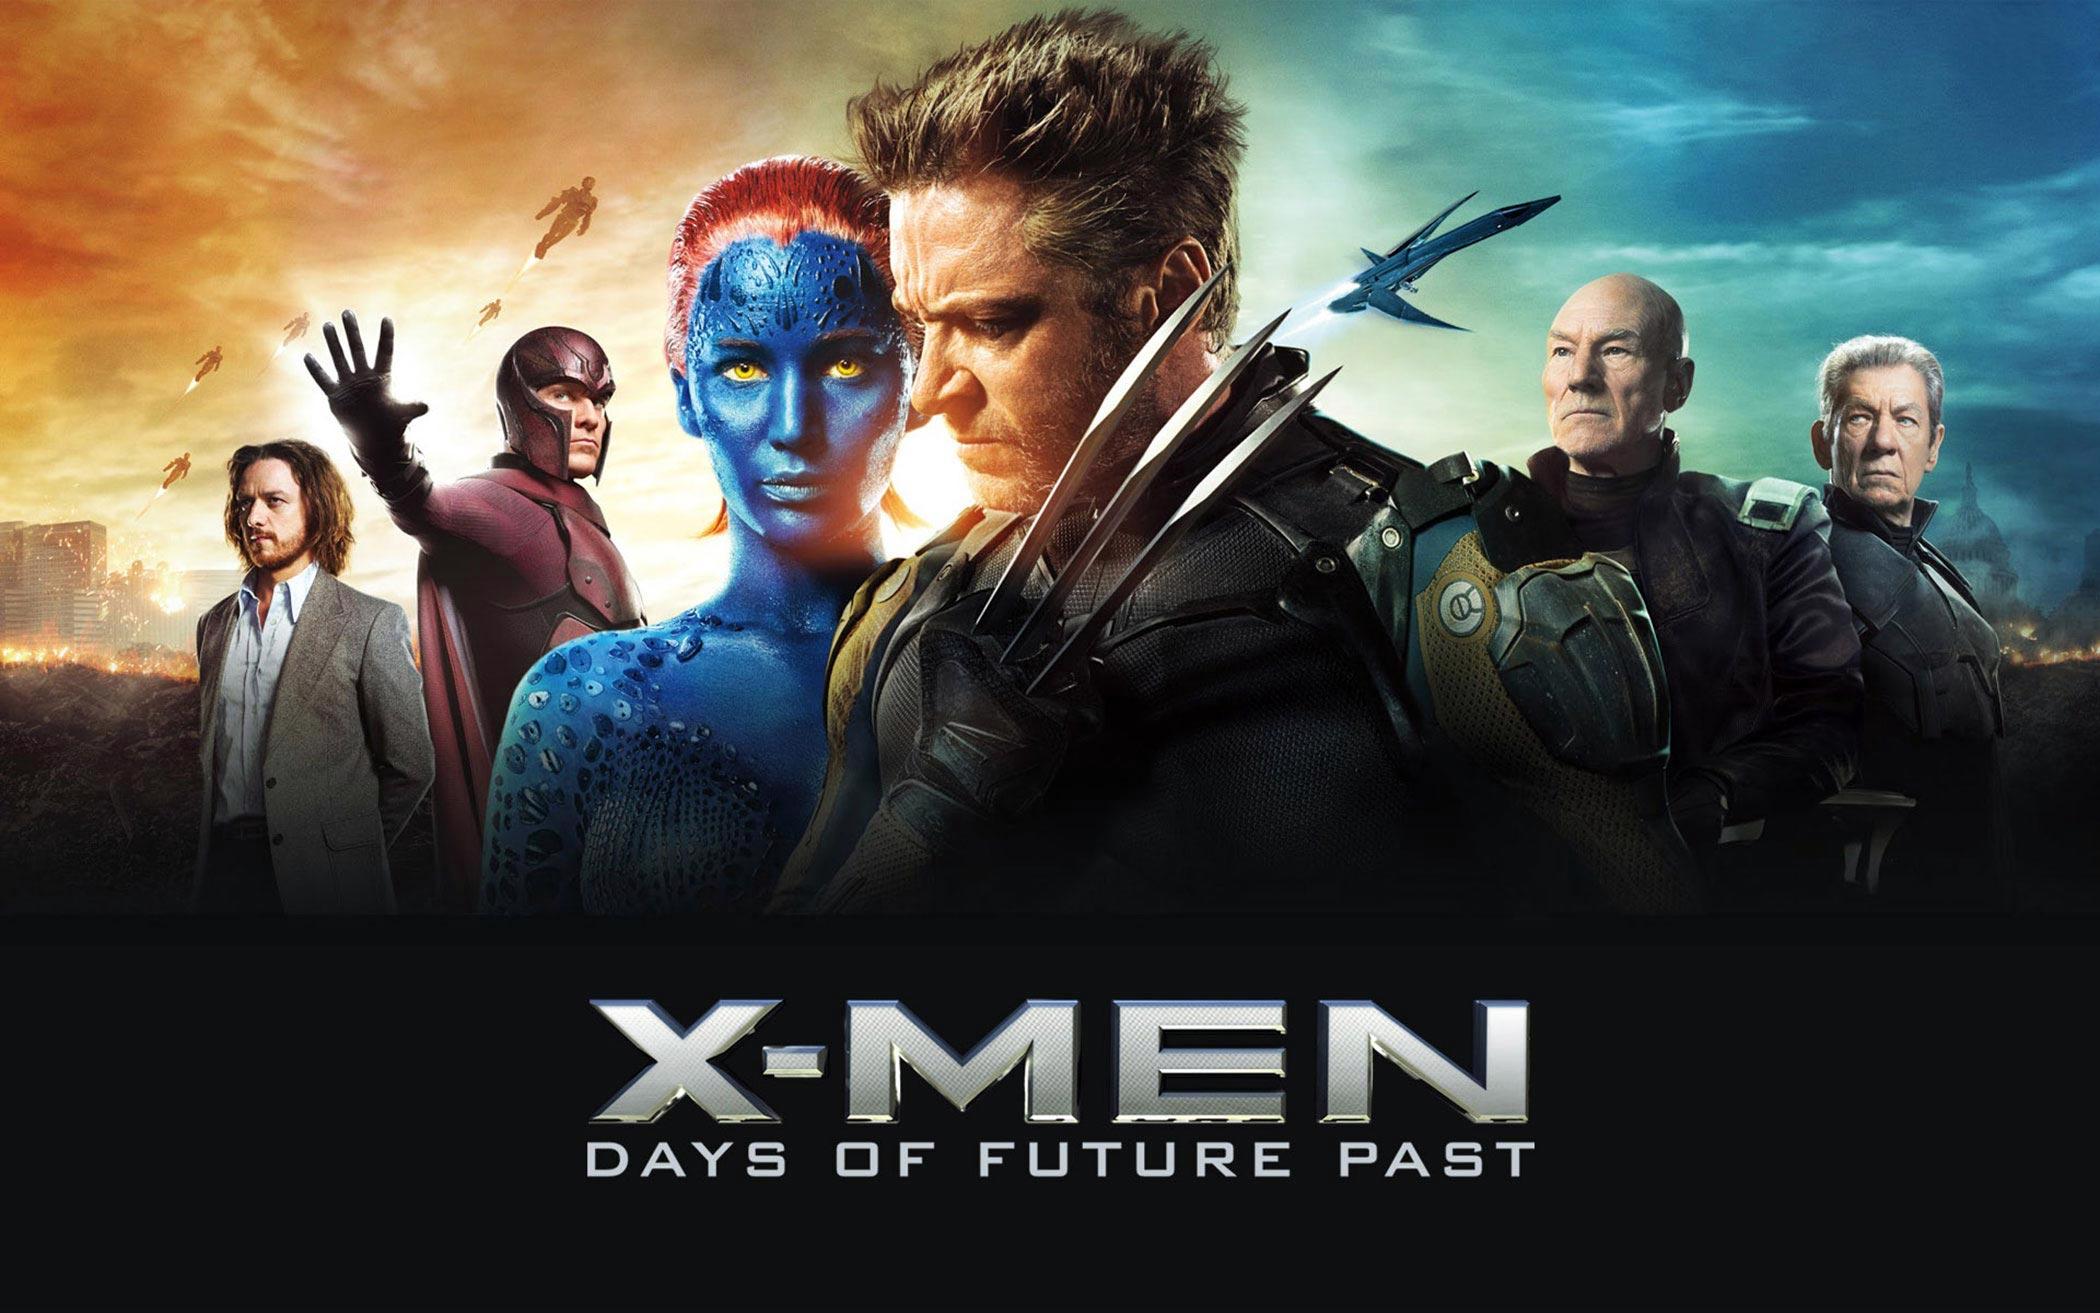 X-Men Days of Future Past wallpaper 5